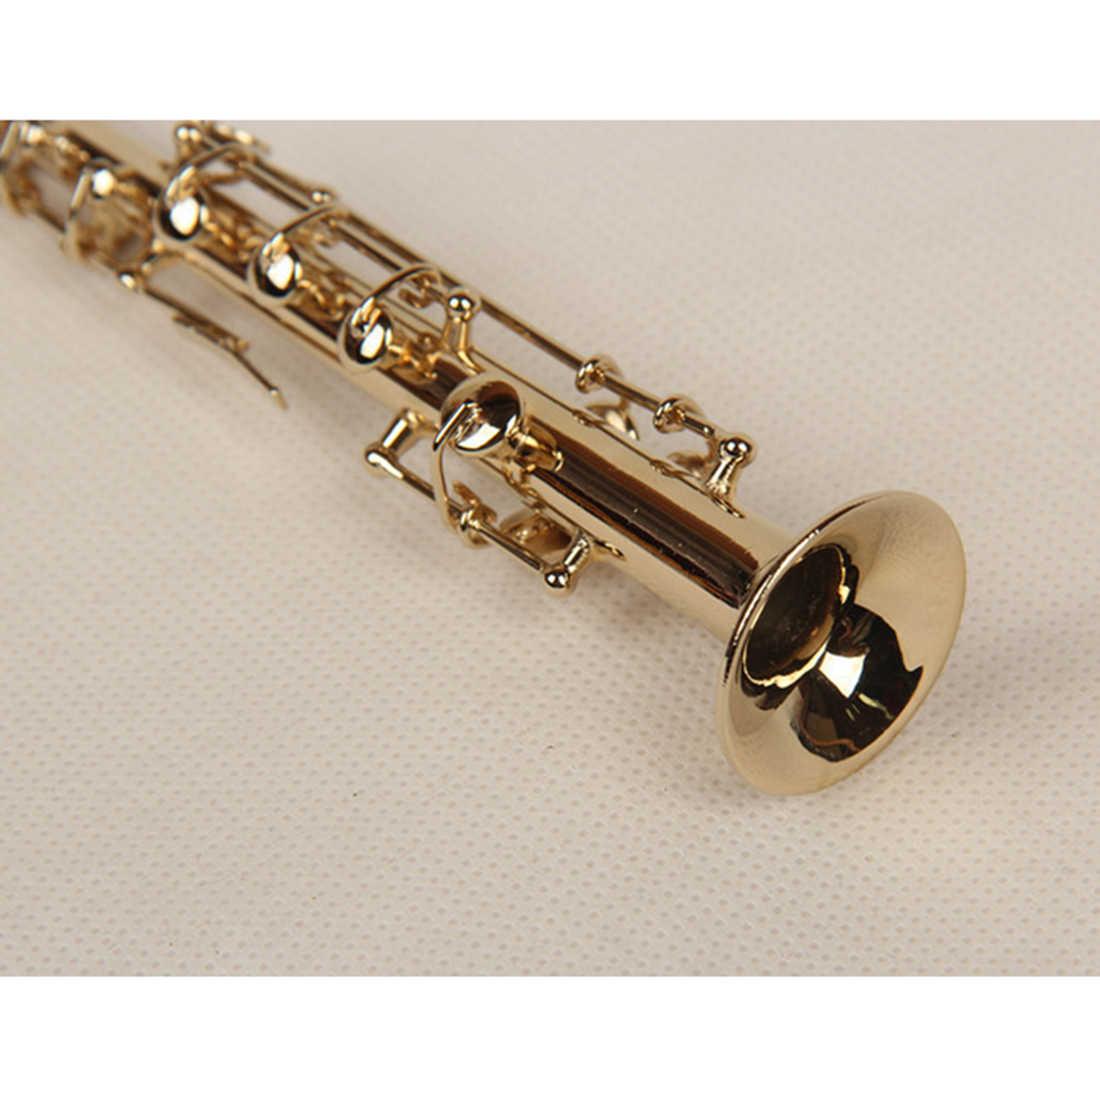 16 Cm Mini Alat Musik Model High-Pitched Saksofon Instrumen Hiasan Perunggu Berdiri Hanya untuk Dekoratif